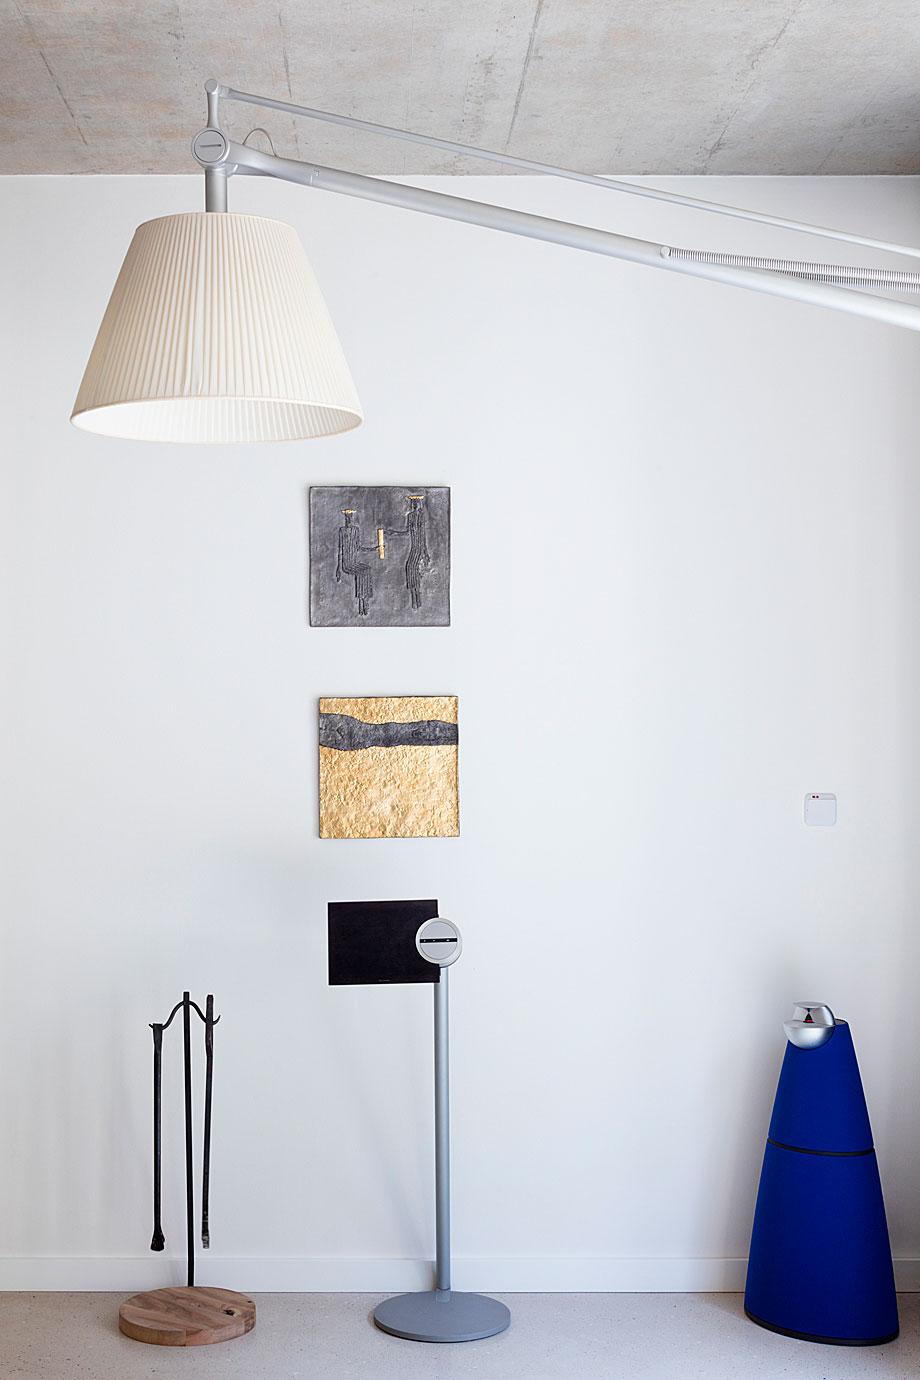 casa-unifamiliar-klanovice-adr-architects-7